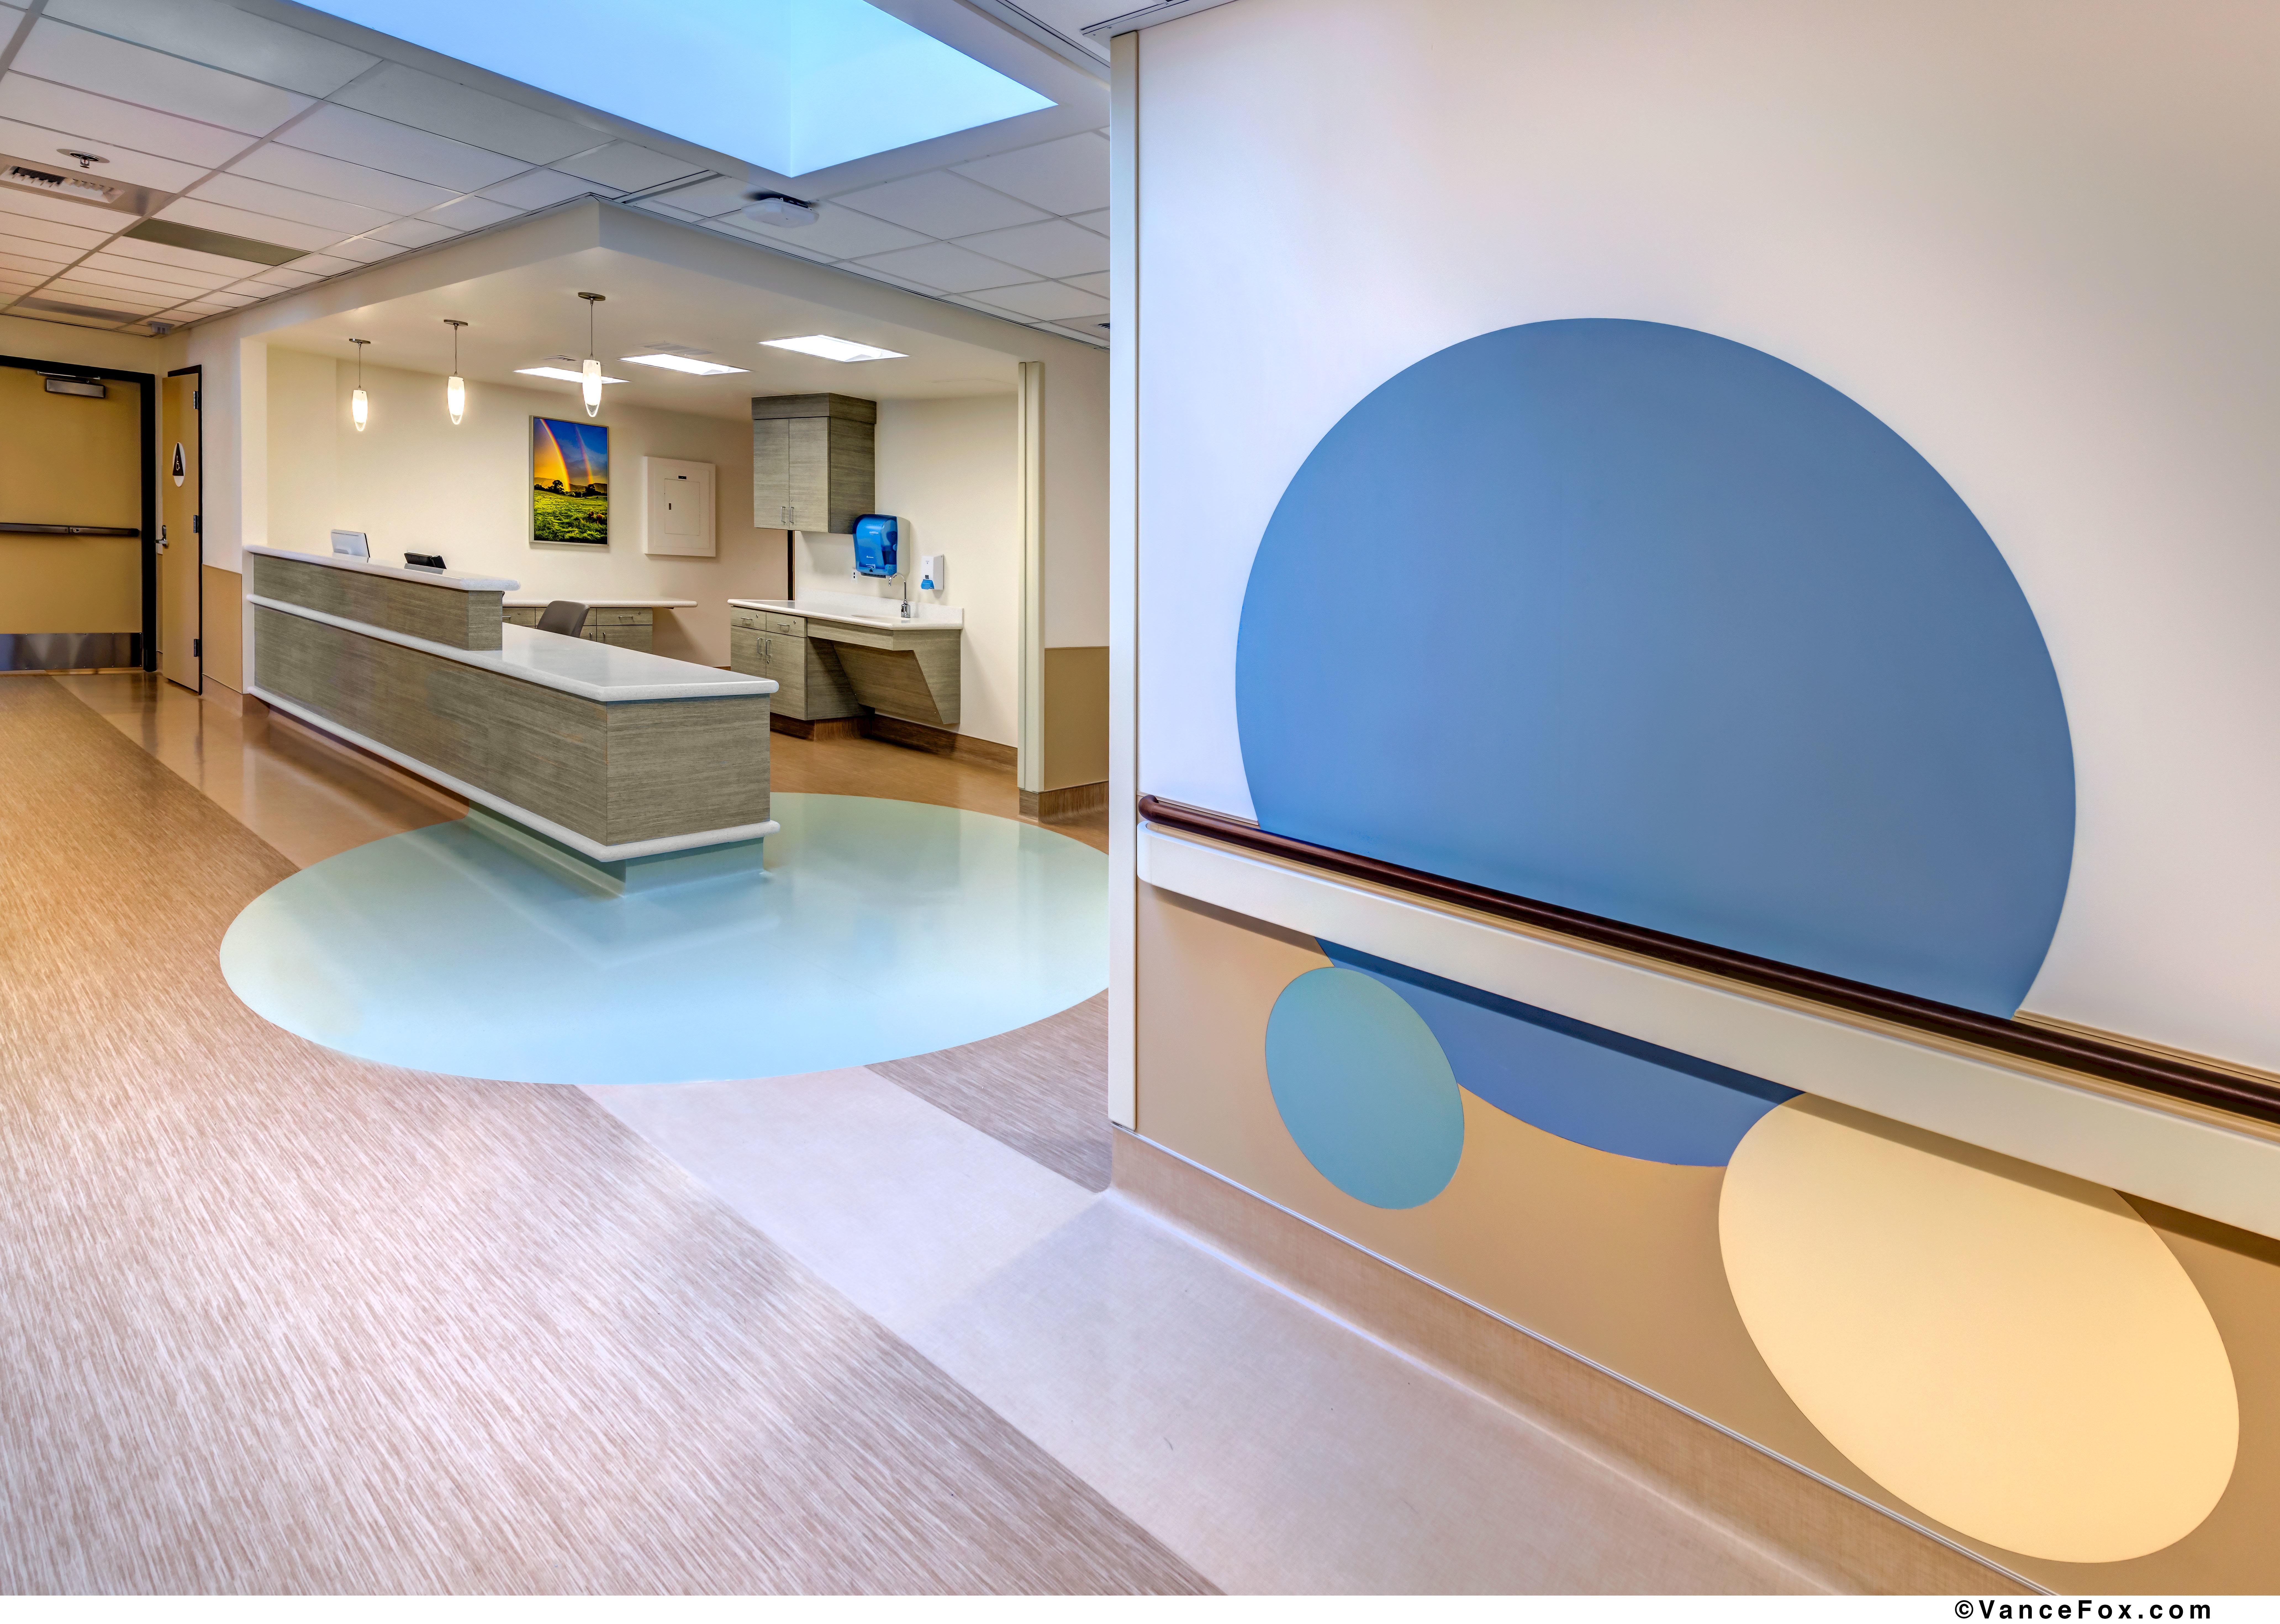 Corridor and Nurse Station